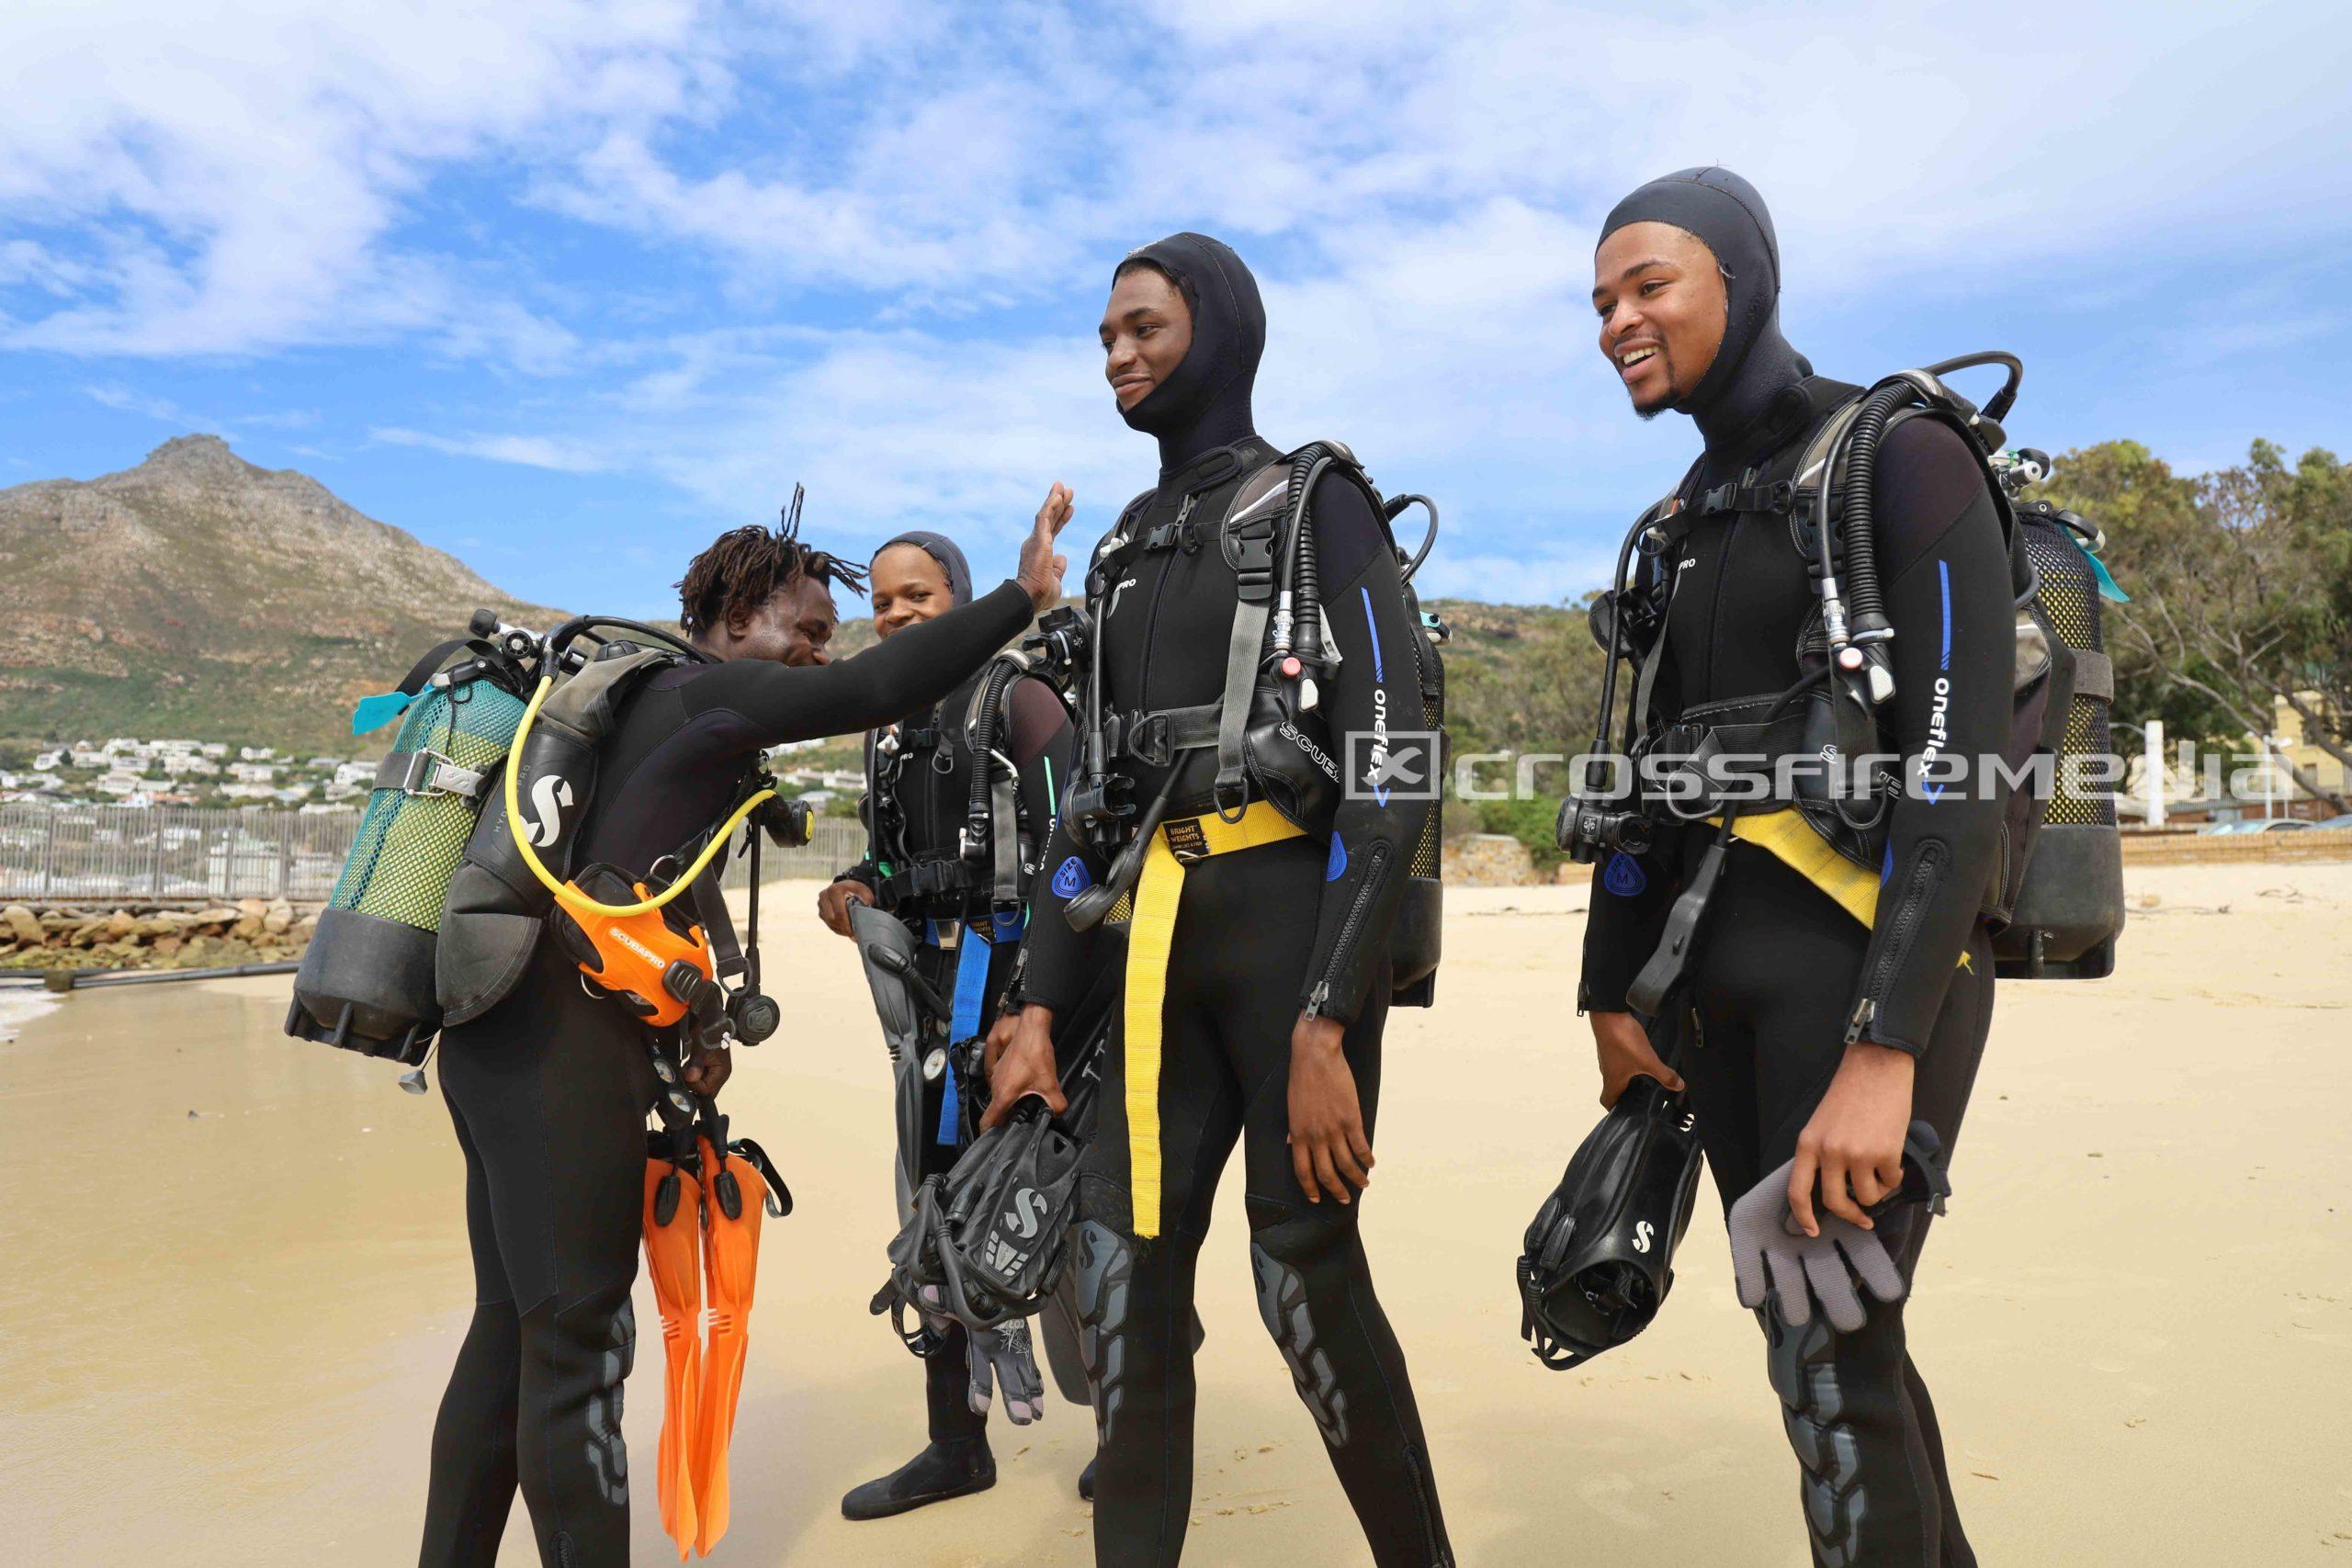 product feature images scuba divers in scuba gear